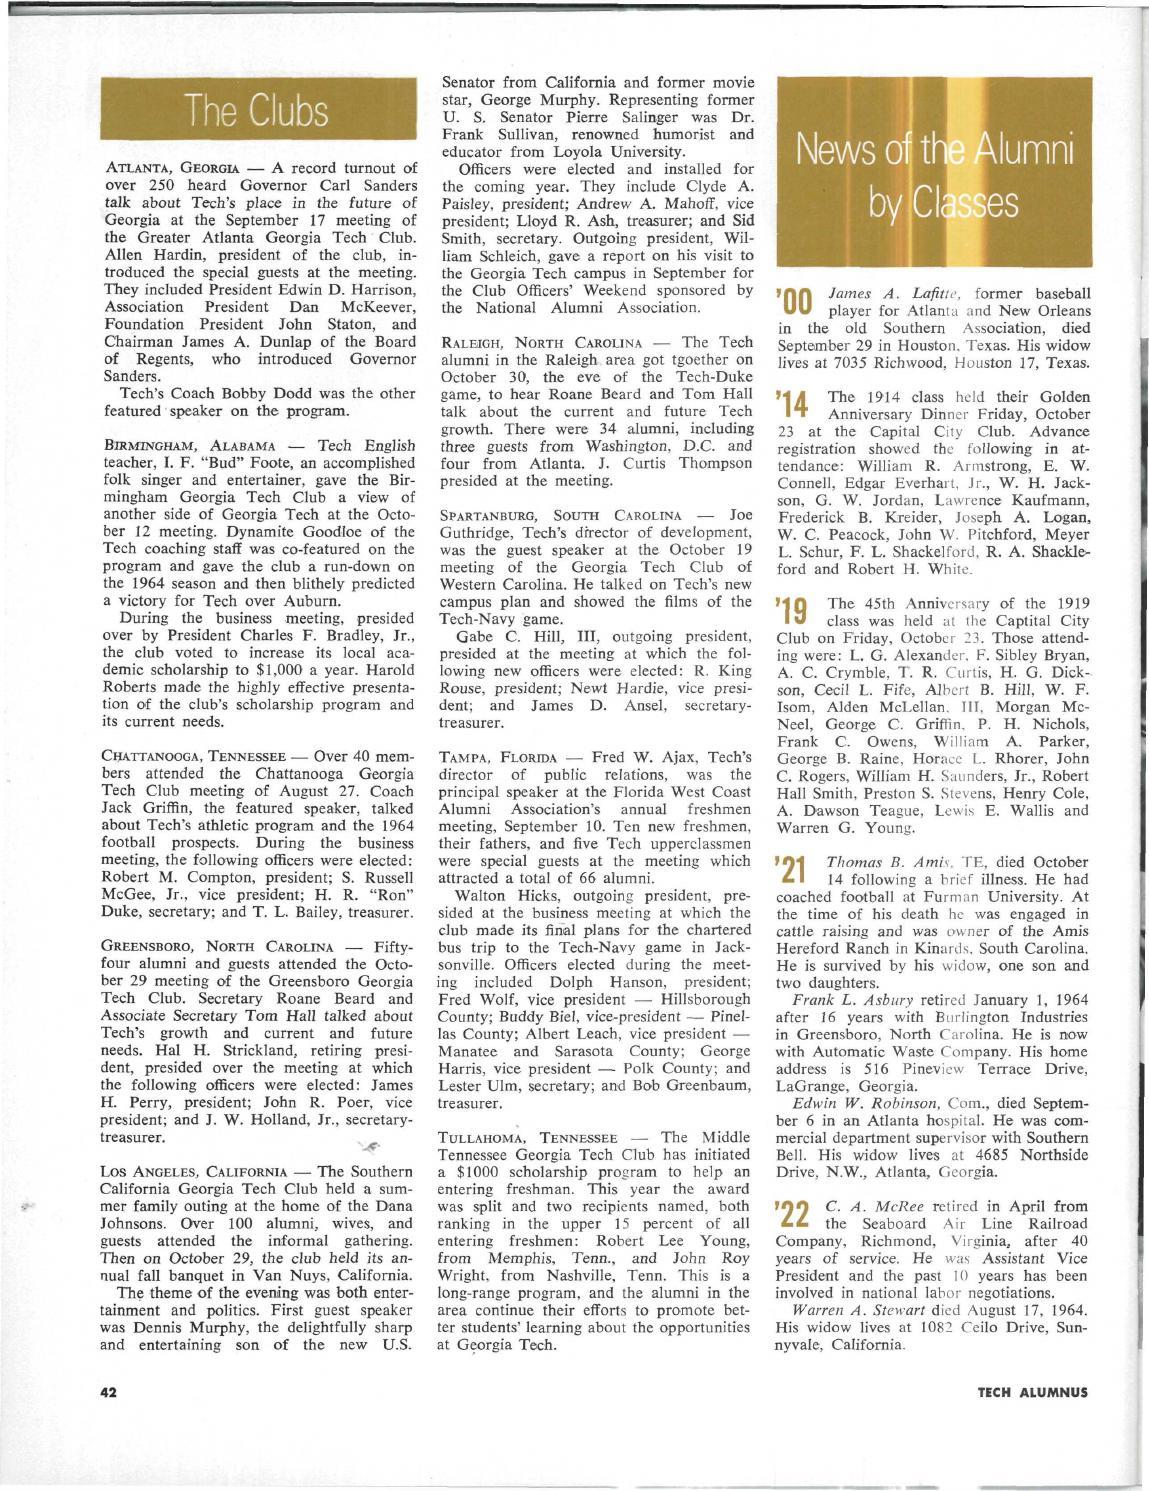 Georgia Tech Alumni Magazine Vol  43, No  3&4 1964 by